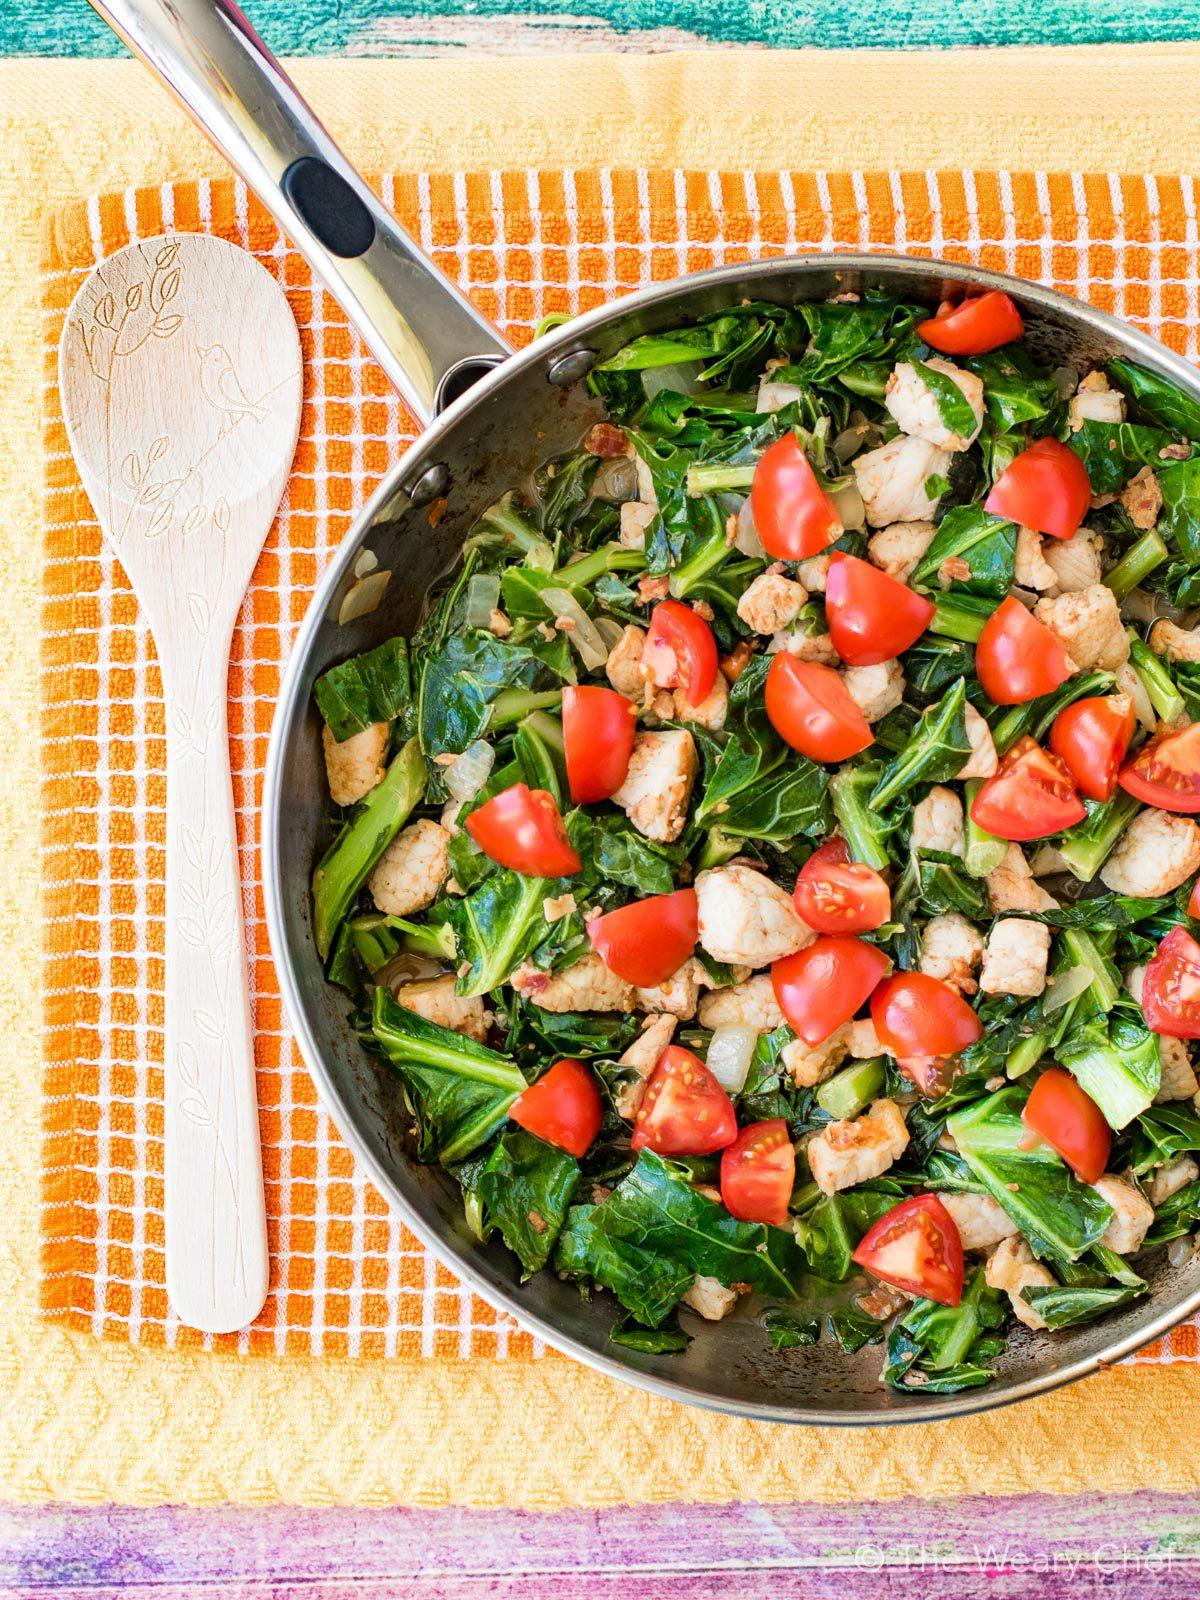 Pork and Greens Stir Fry: As tasty as it is pretty!